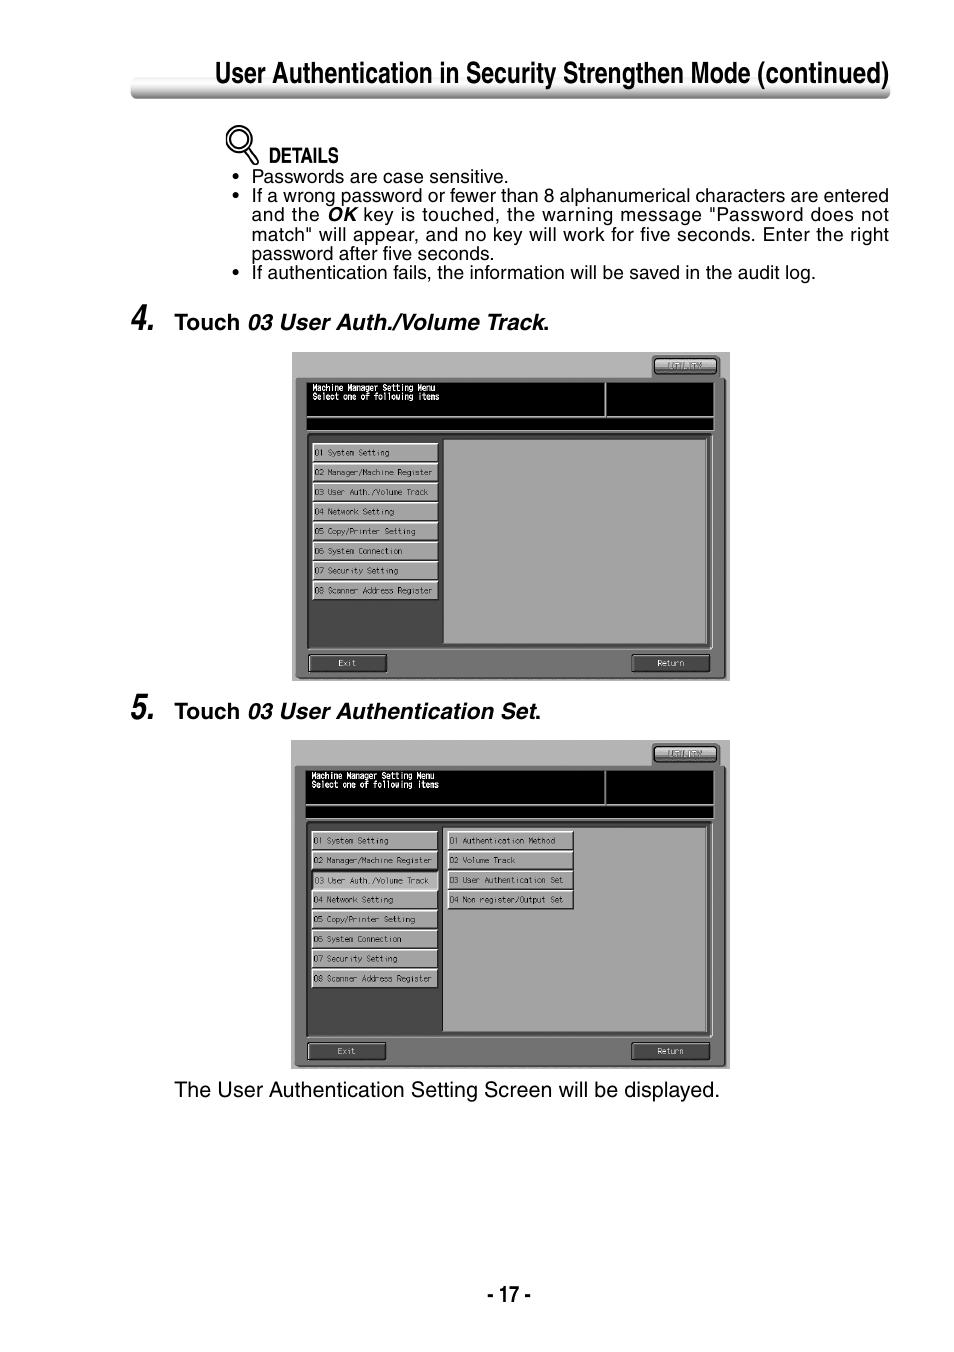 Konica Minolta BIZHUB PRO 1050 User Manual   Page 25 / 64